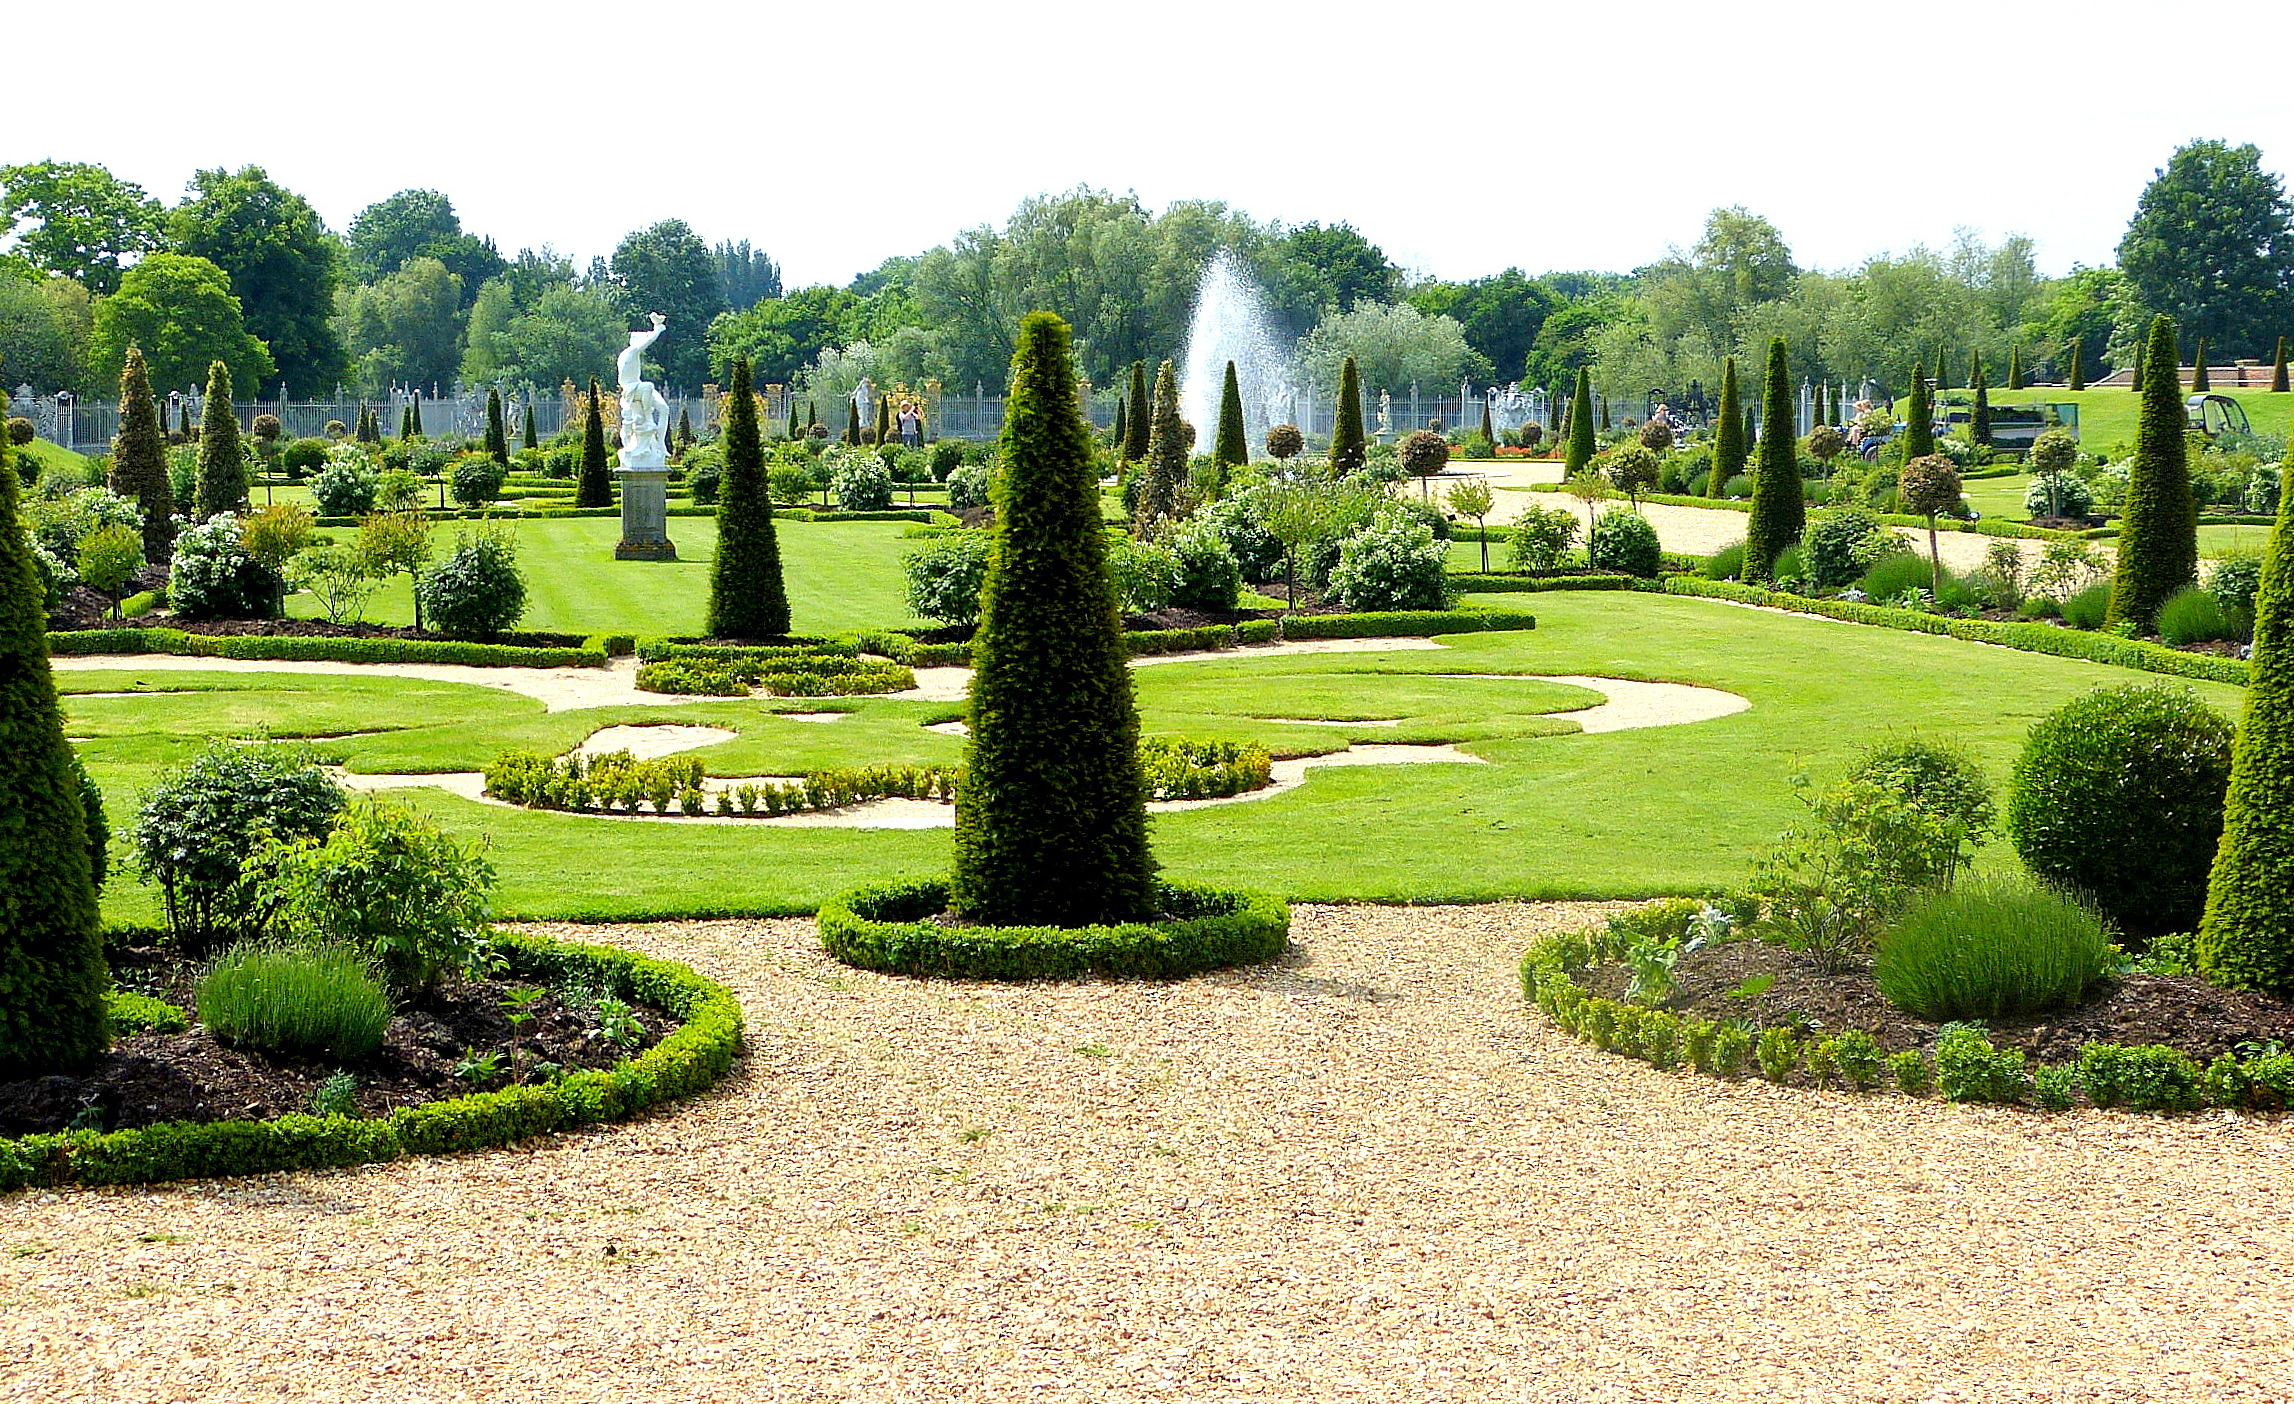 Verdant landscaping surrounds Hampton Court Palac